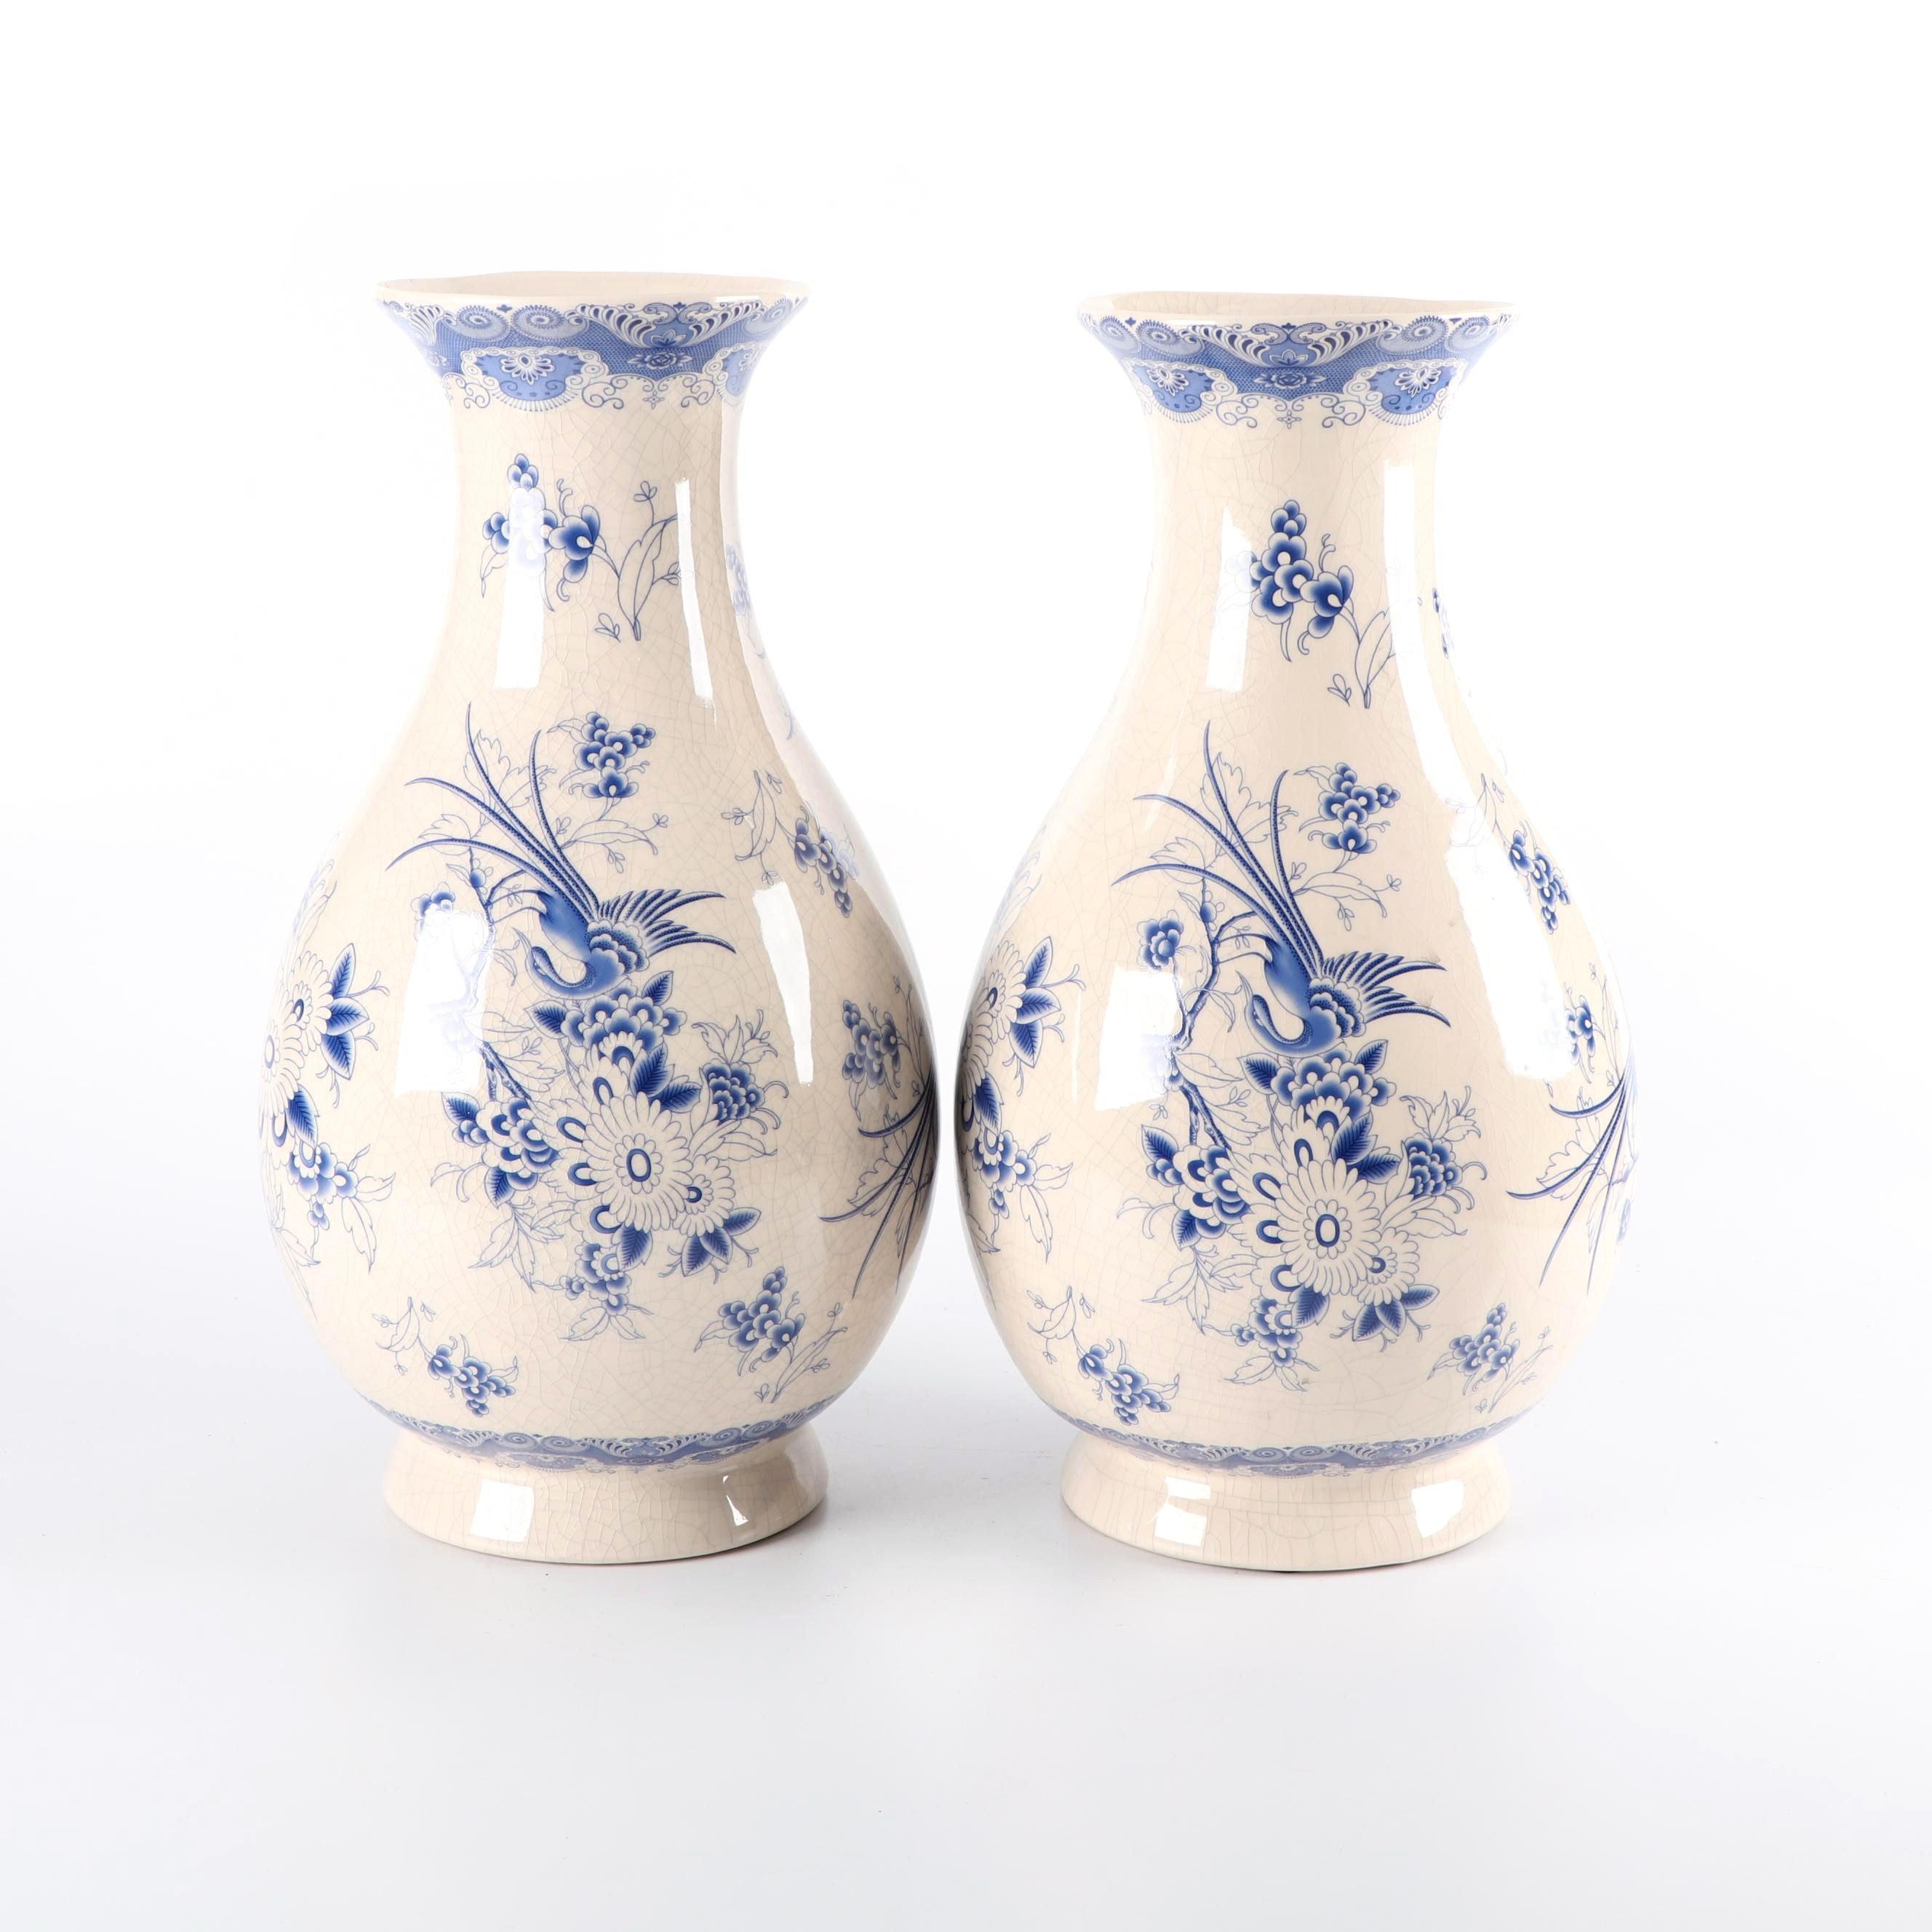 Chinese Blue and White Ceramic Vases